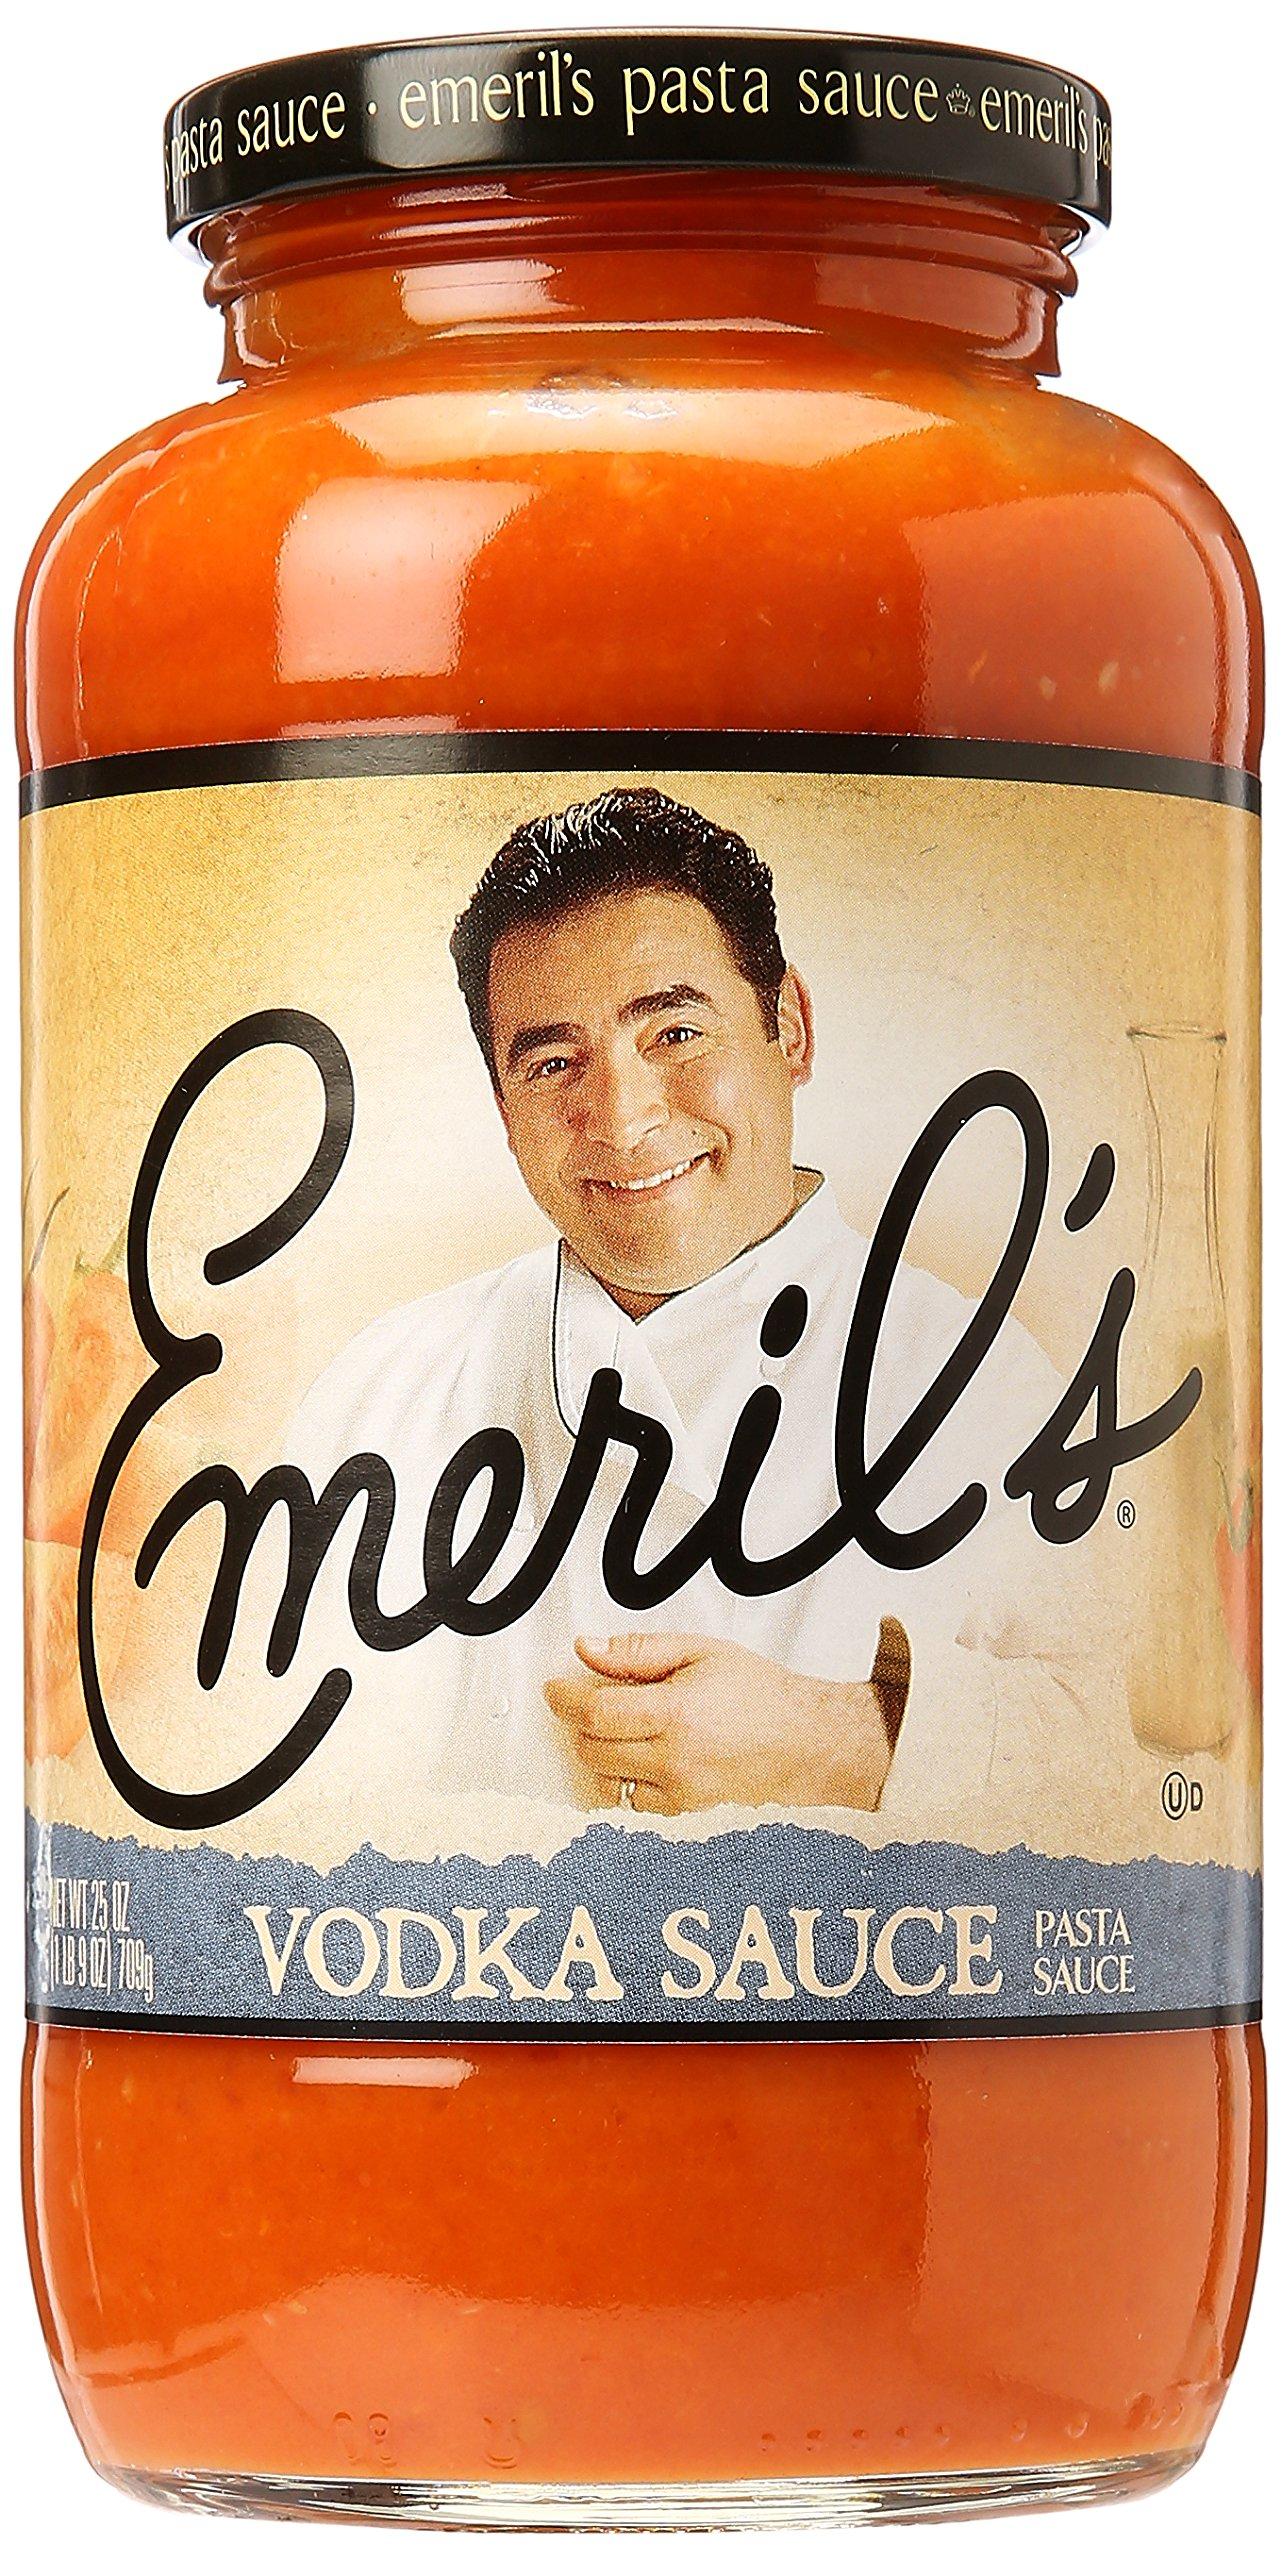 Emeril's Vodka Sauce, 25 oz